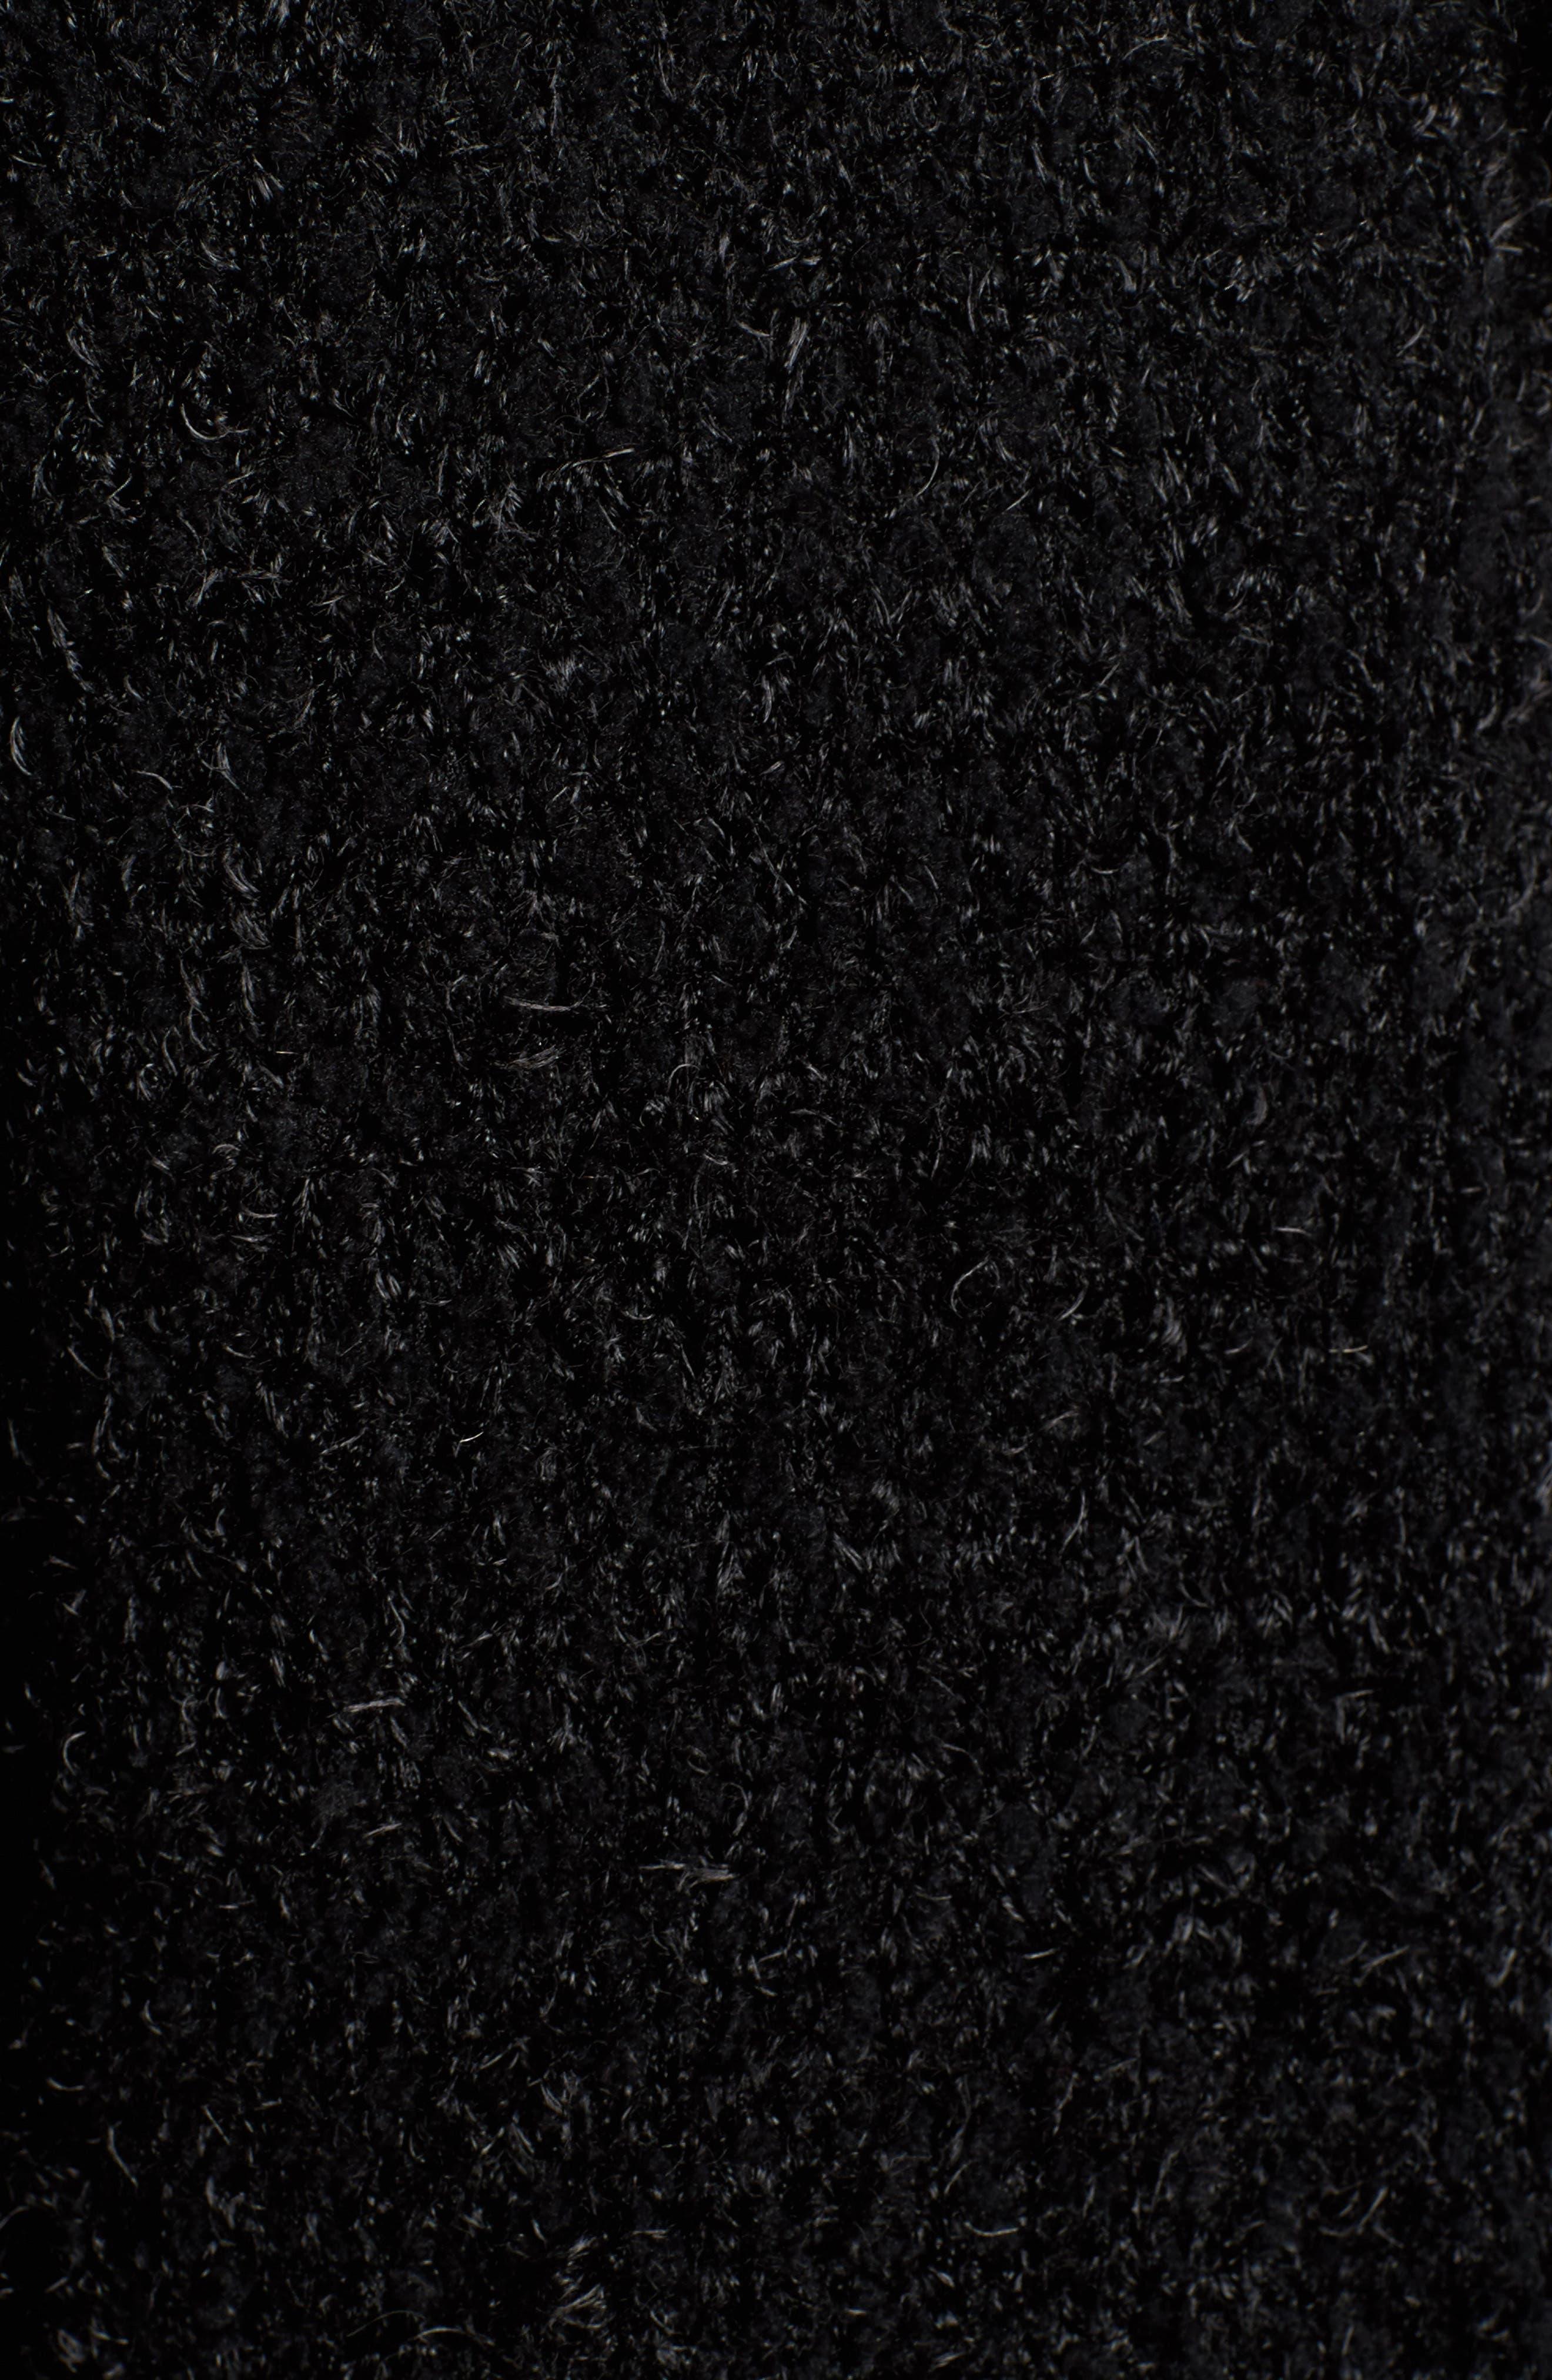 Eyelash Hooded Cardigan,                             Alternate thumbnail 5, color,                             Black